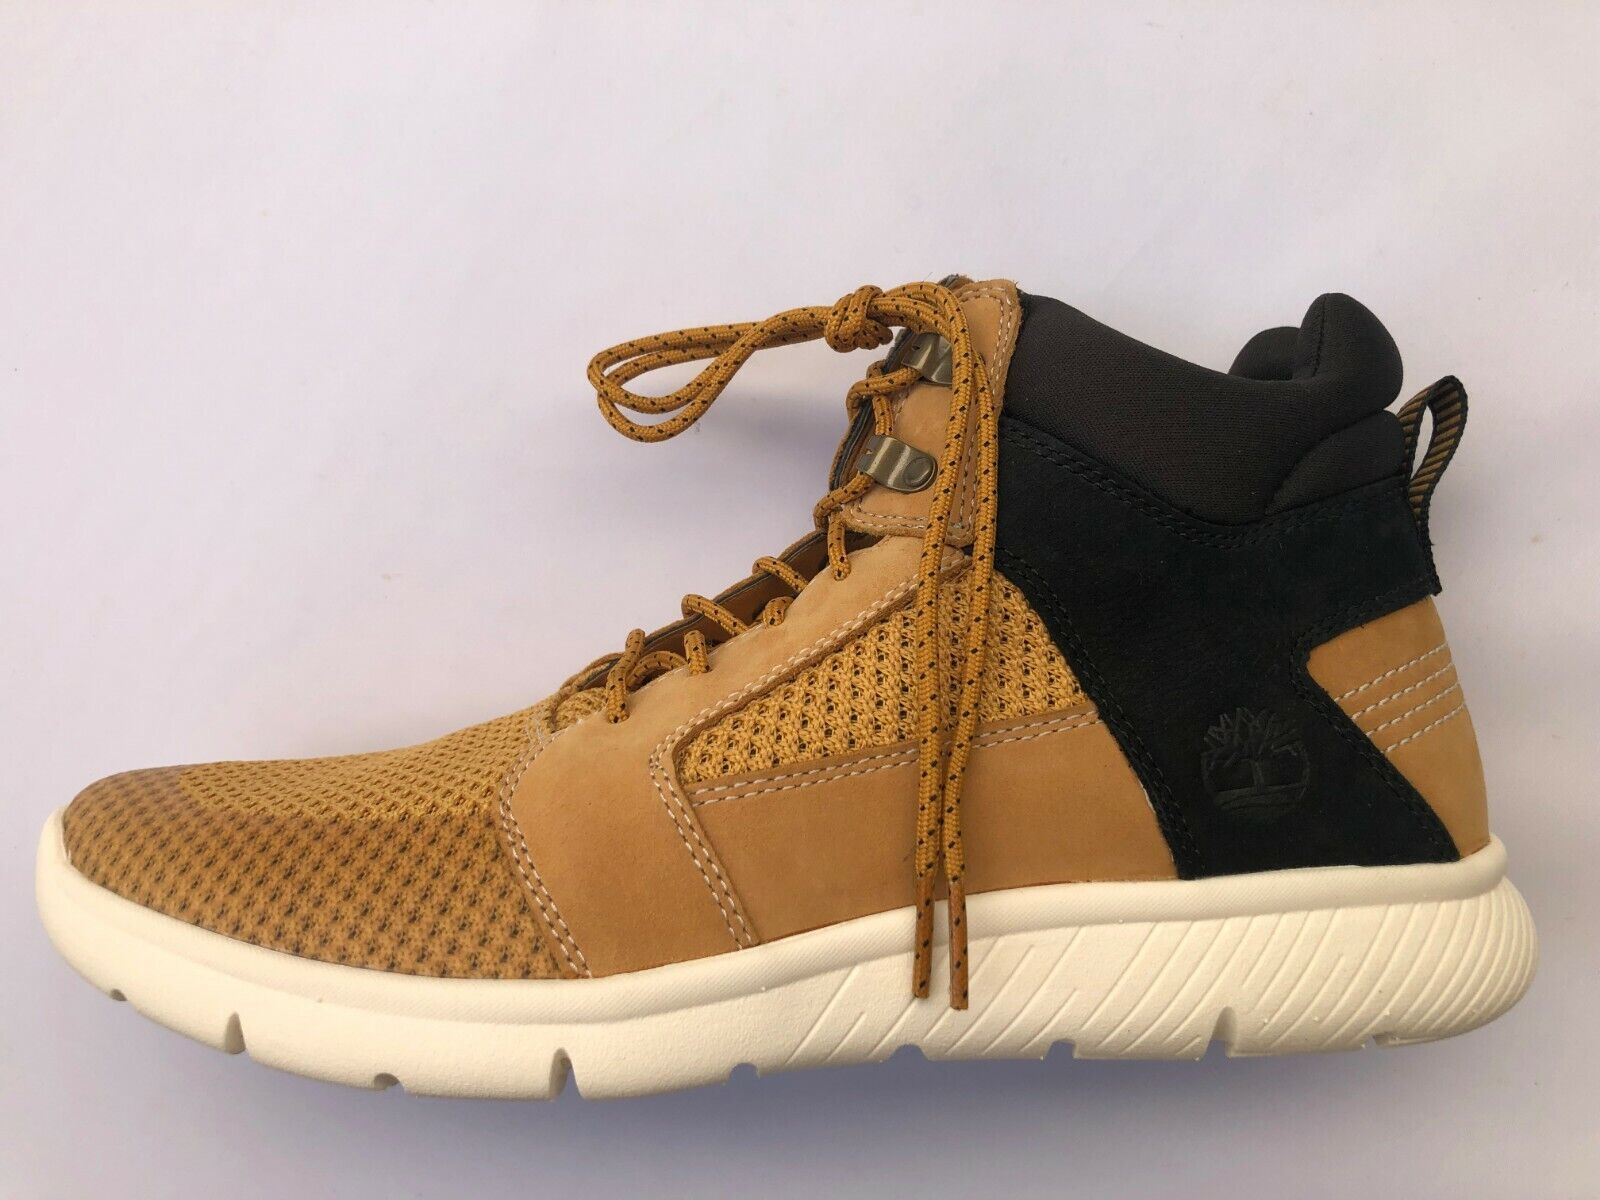 Timberland Men's Boltero Mid Lightweight Sneaker Chukka Boot Shoe Beige